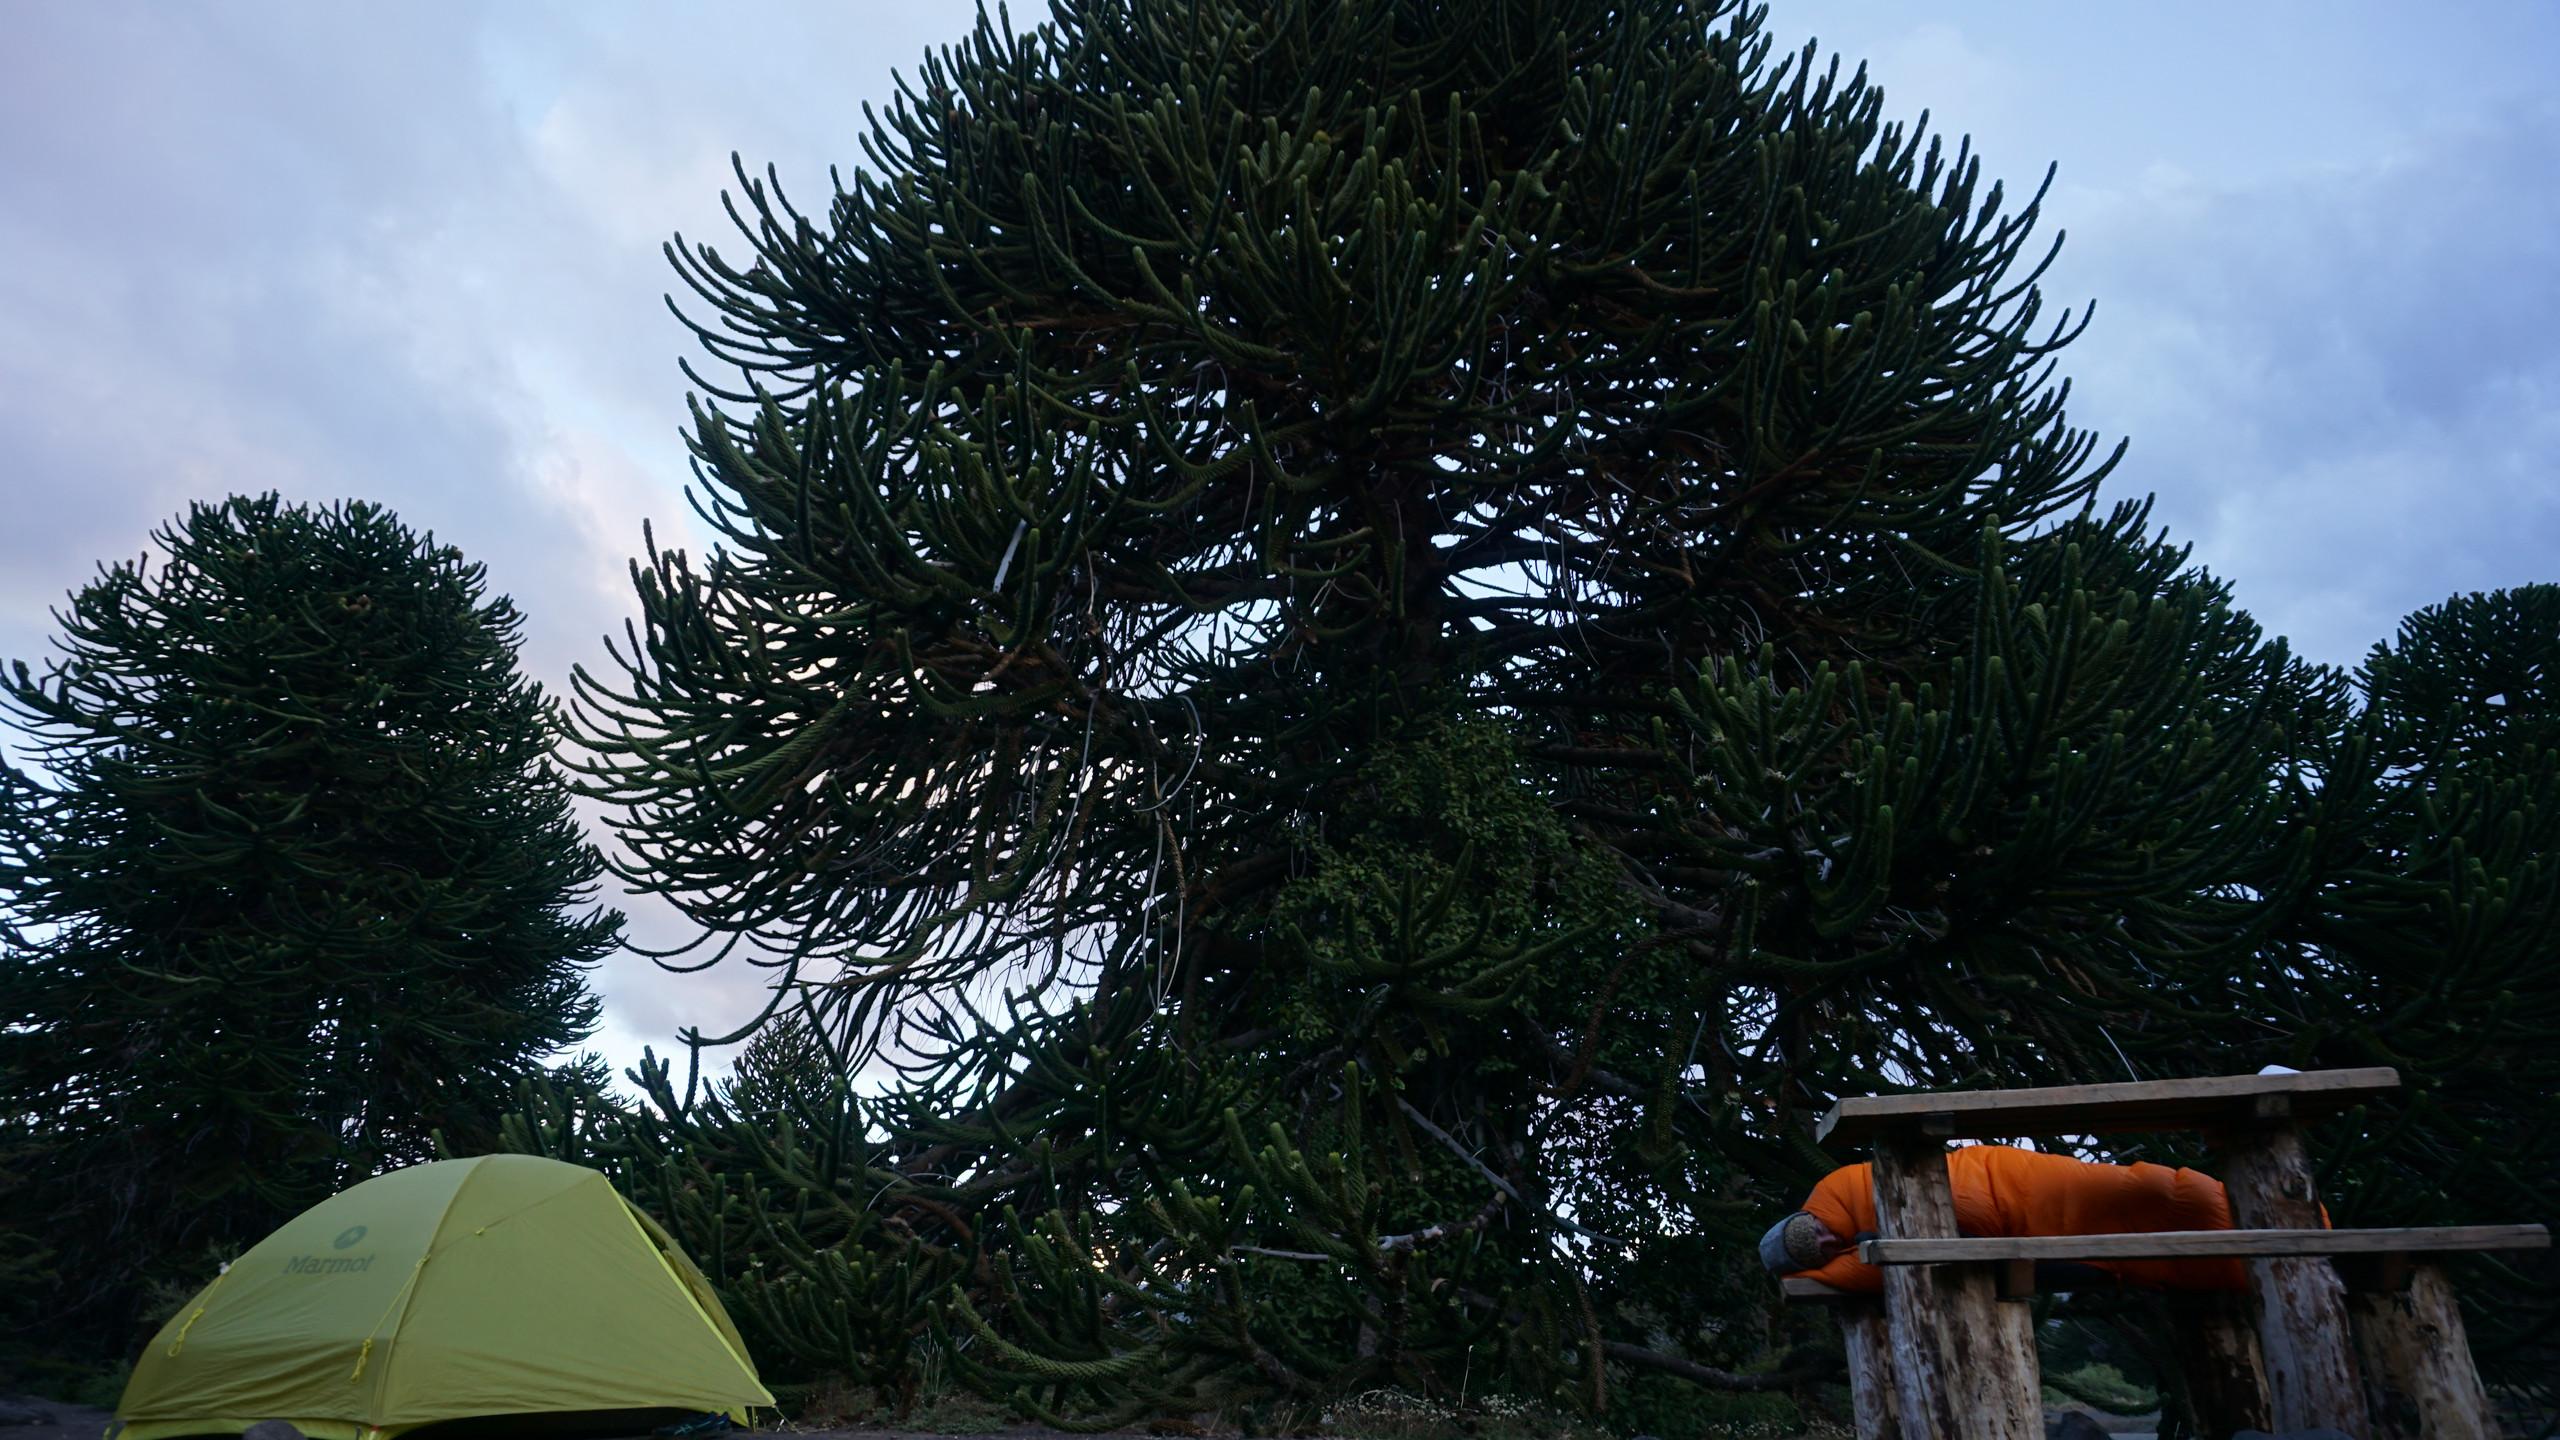 Sleeping under the Araucaria trees